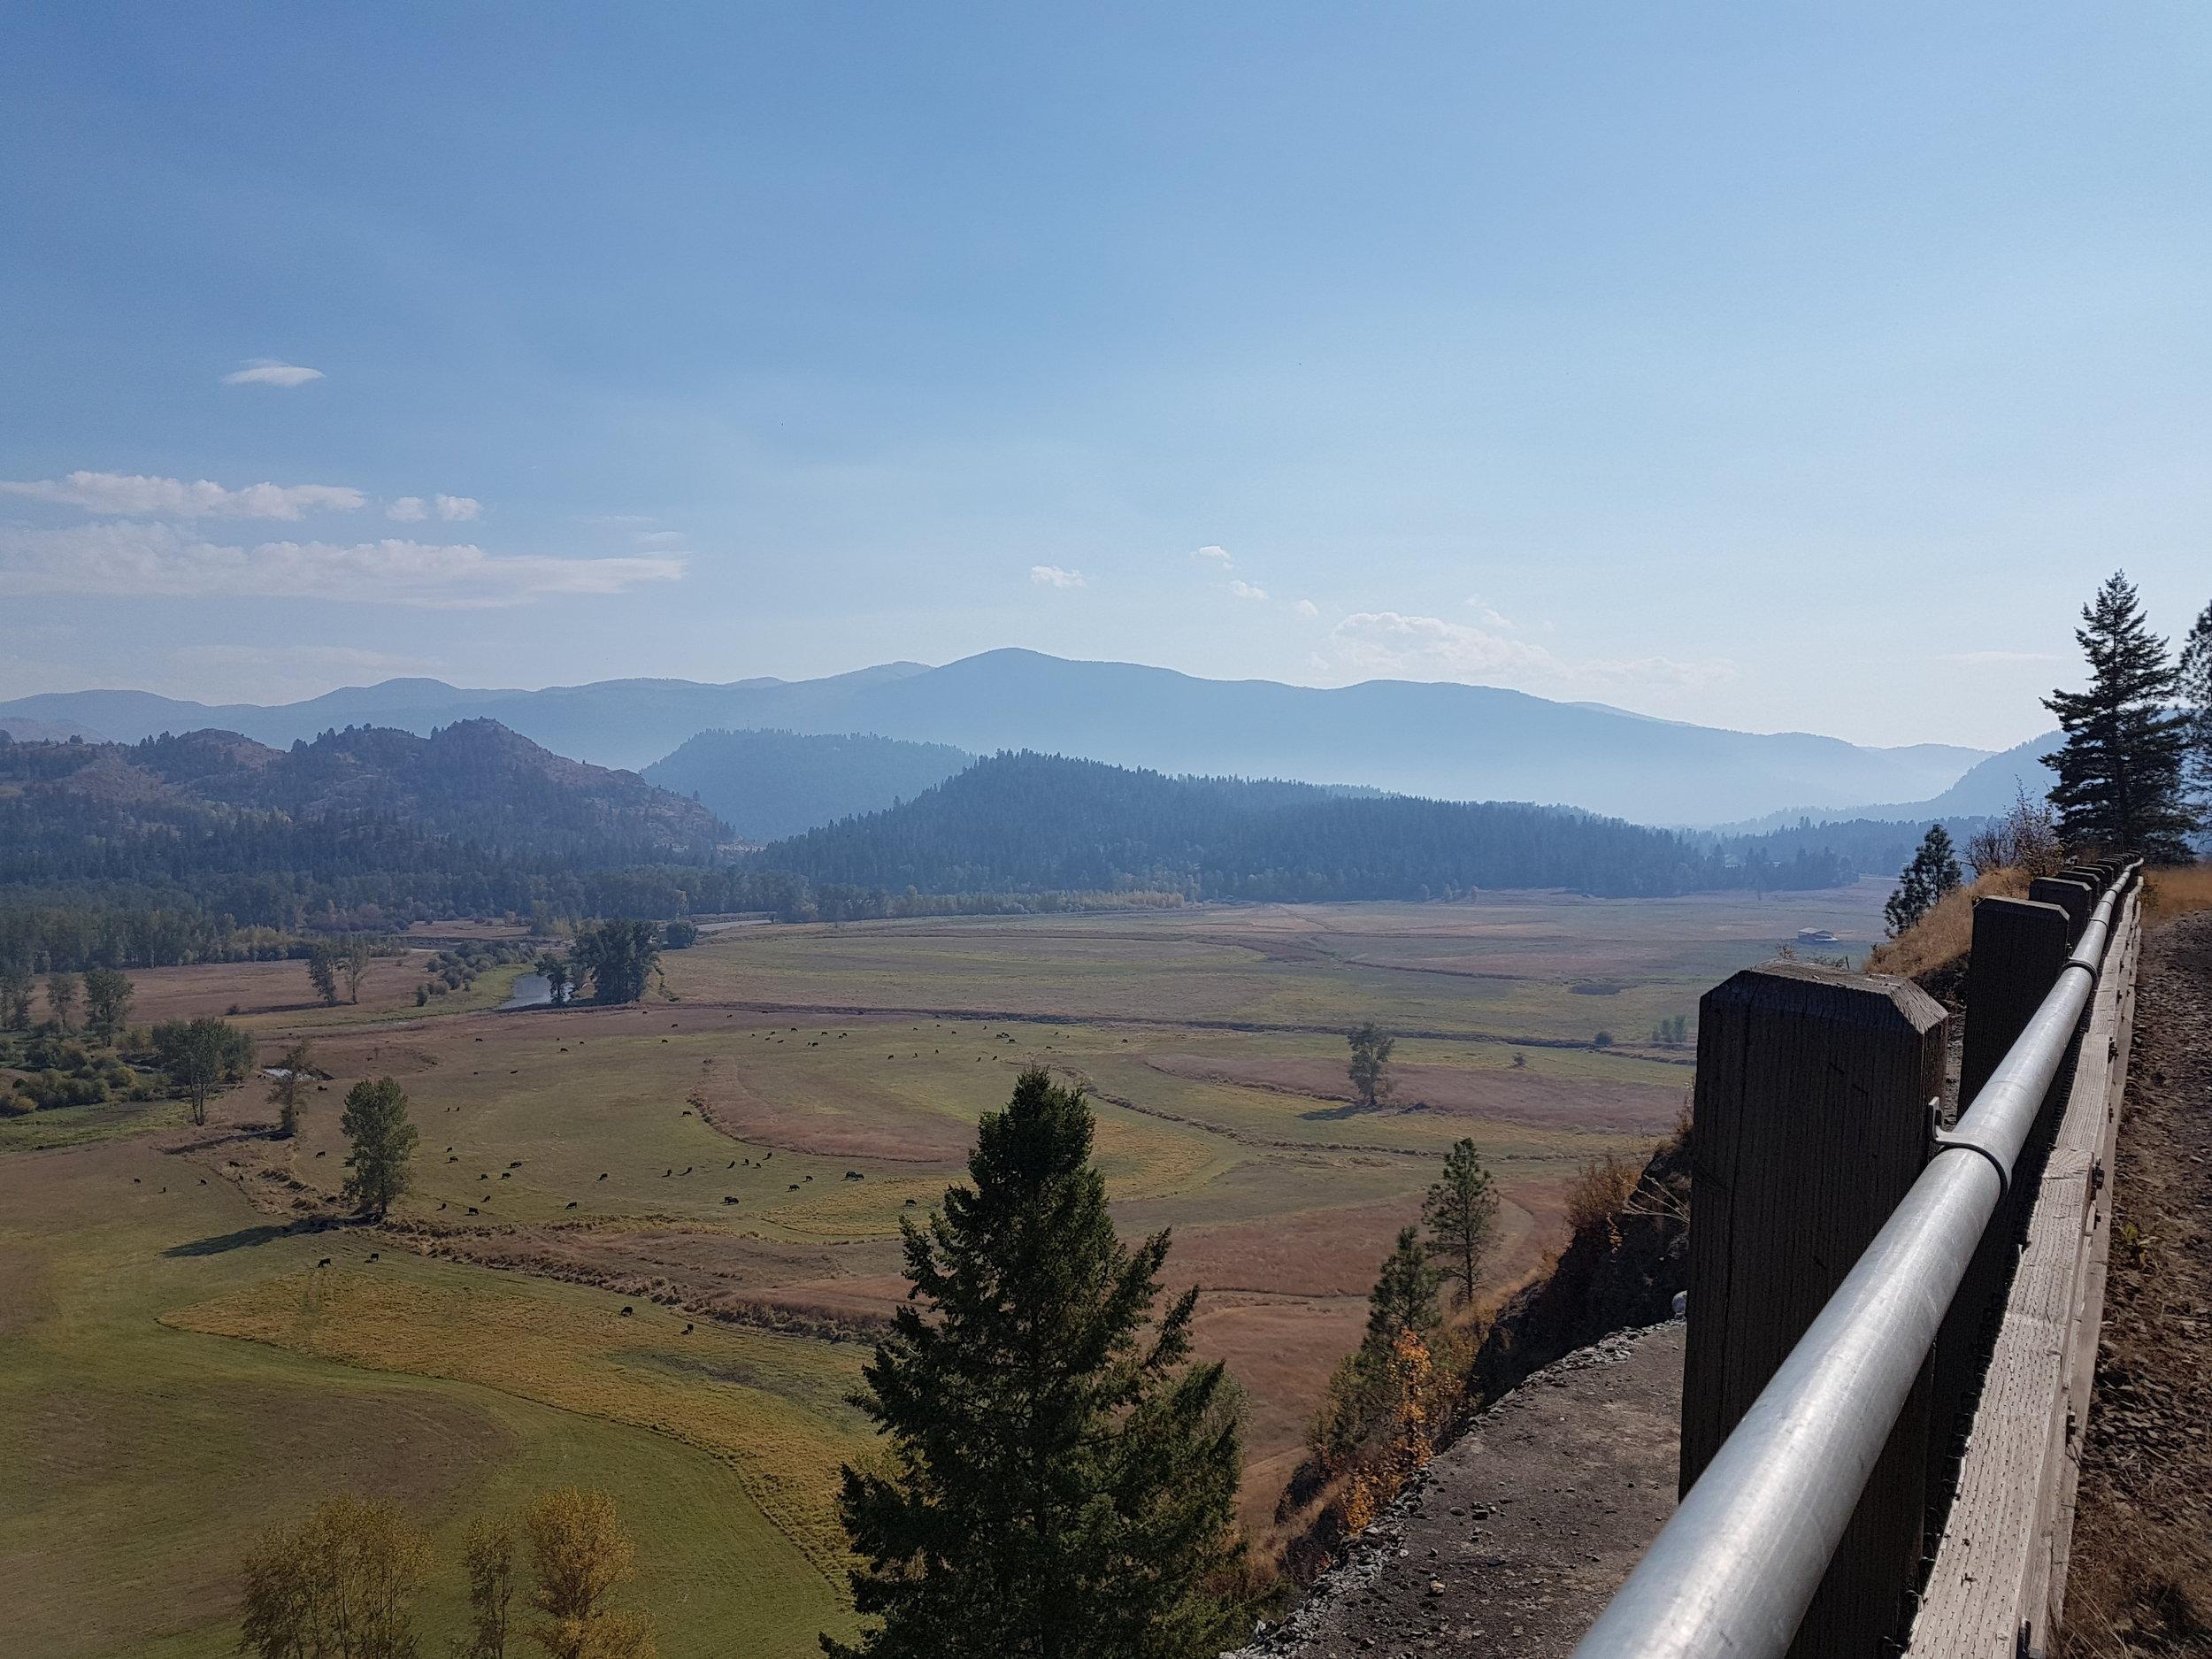 Views from C&W Rail Trail near Grand Forks